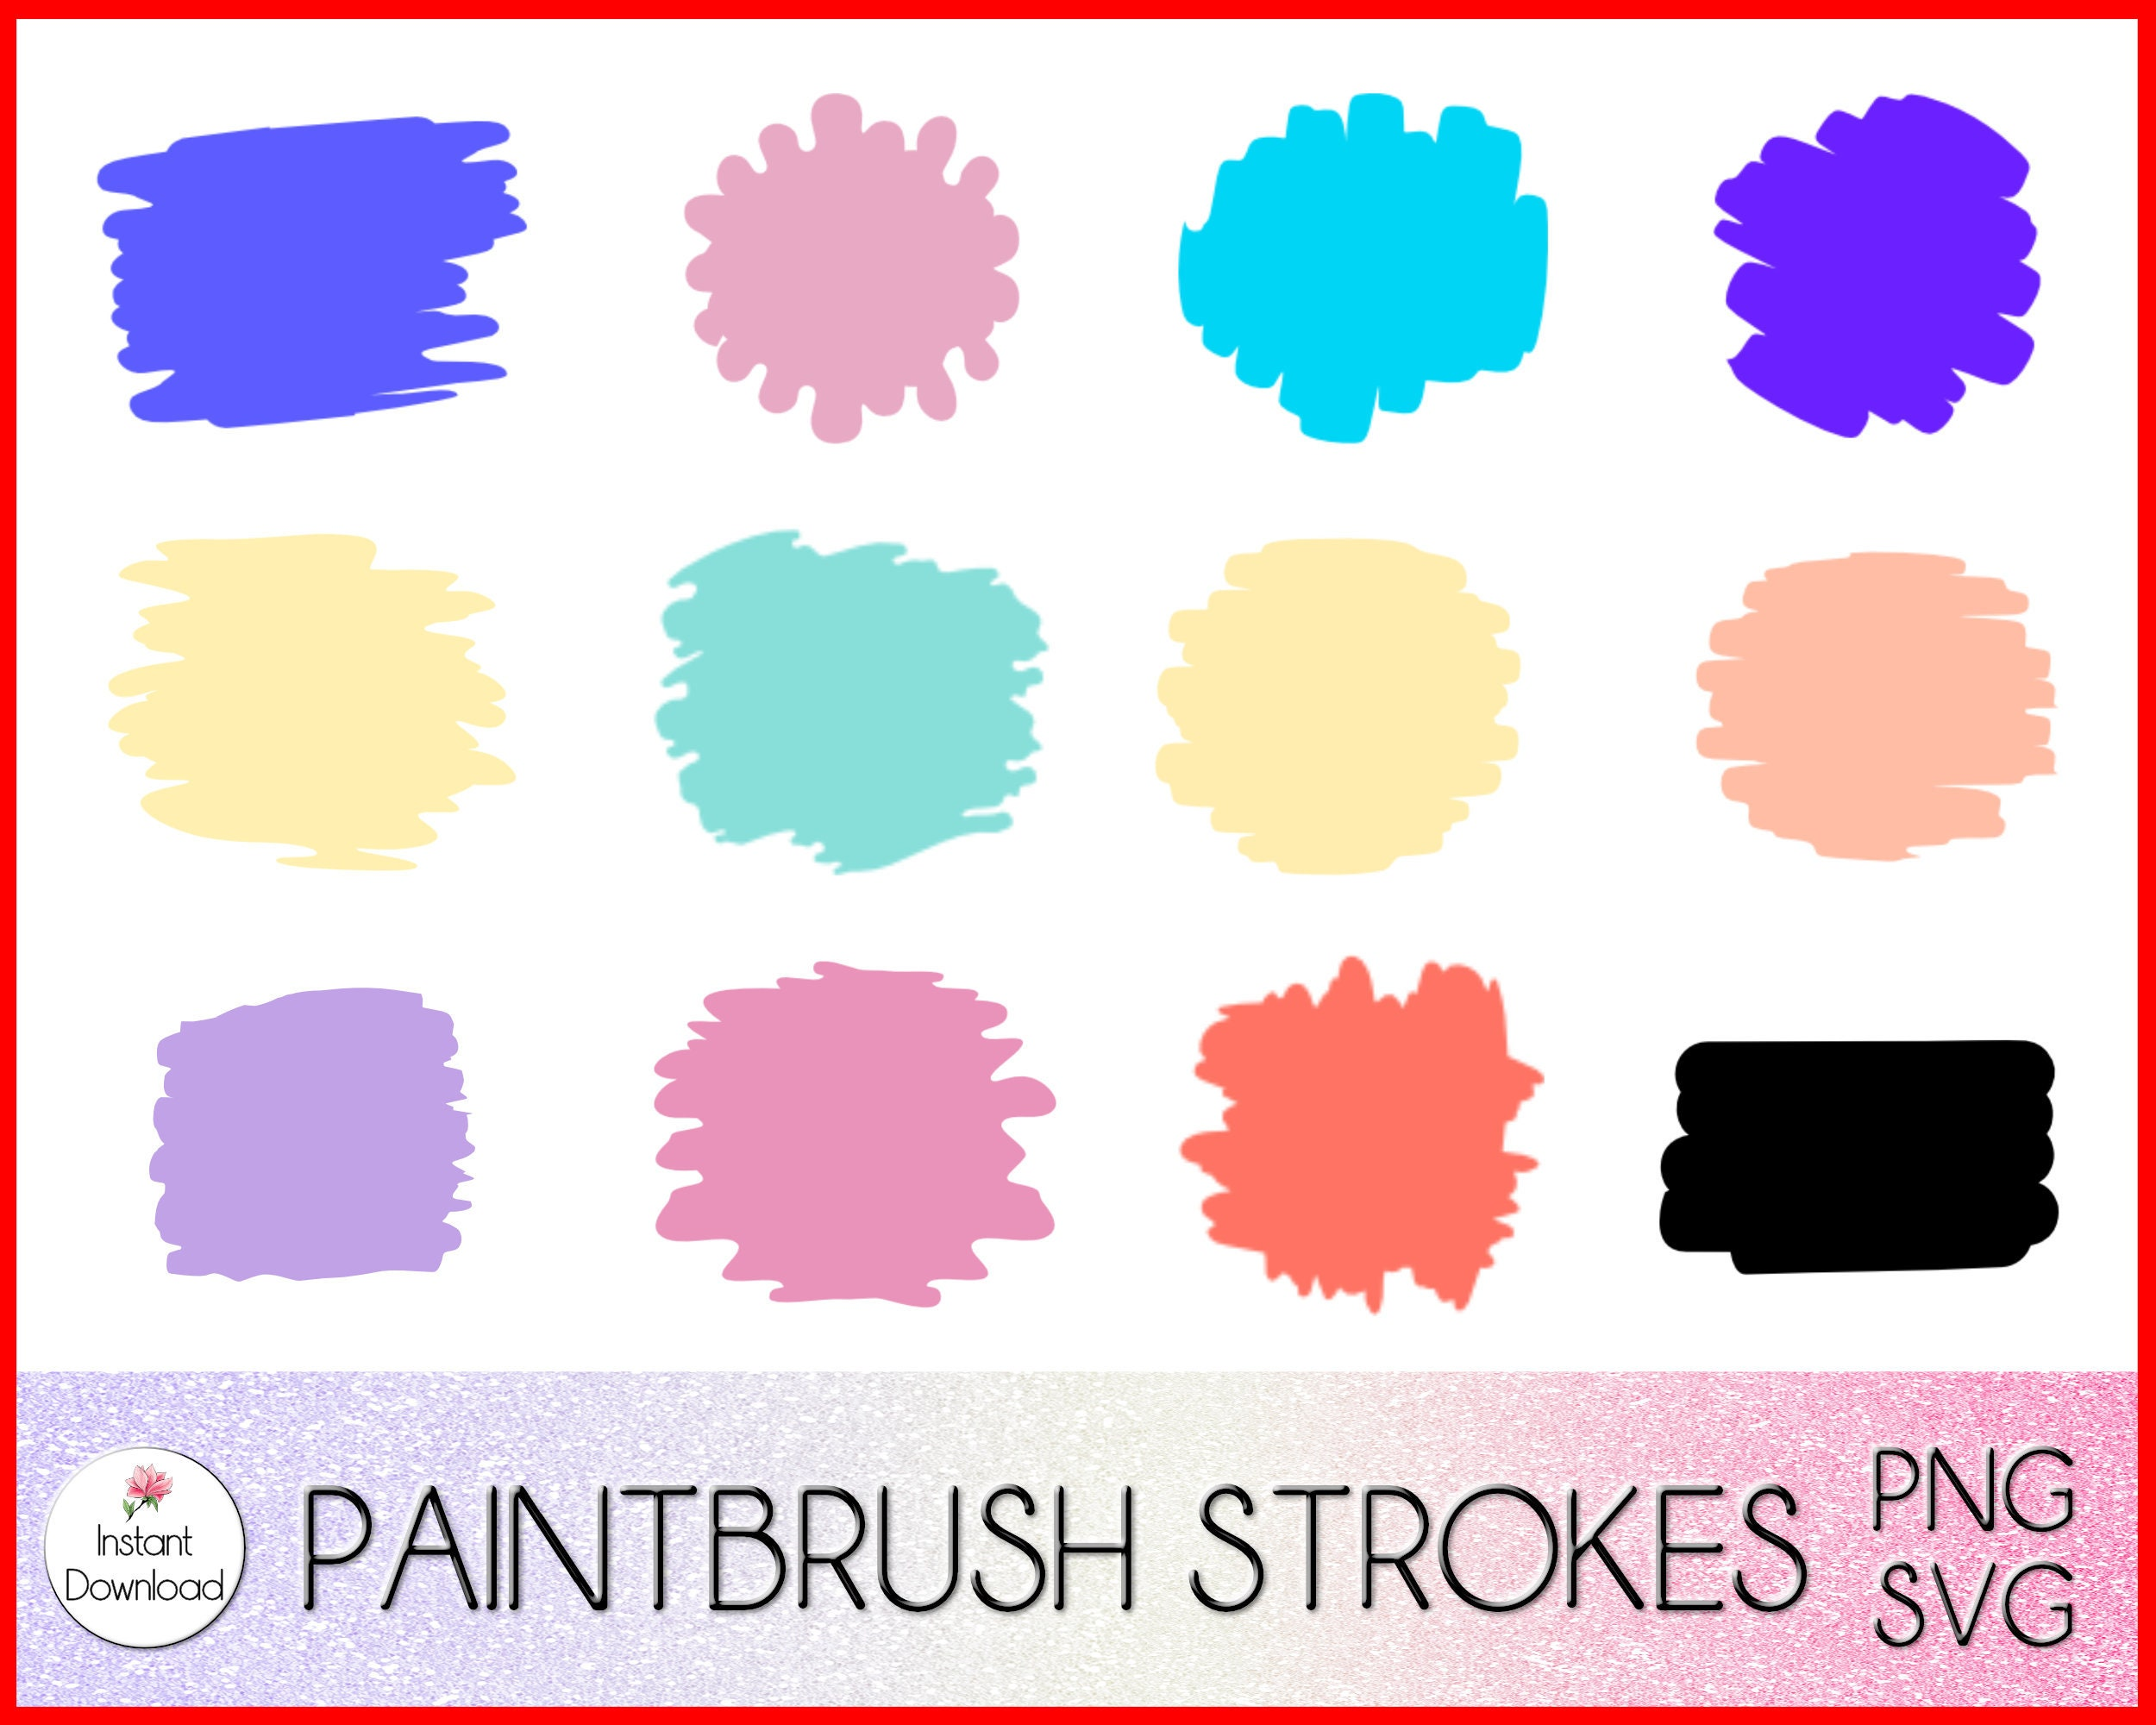 Round Paint Brush Stroke Svg Keychain Svg – 338+ Crafter Files